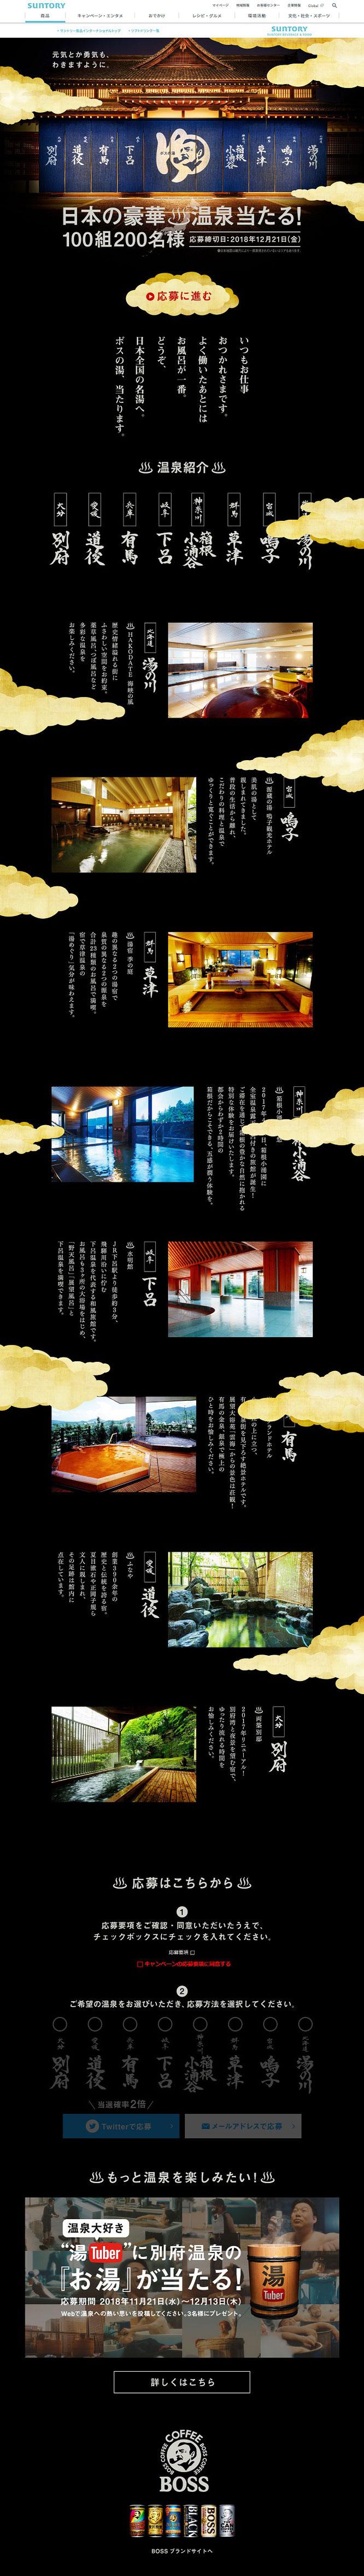 【BOSS】ボスの湯 日本の豪華温泉当たる!キャンペーン